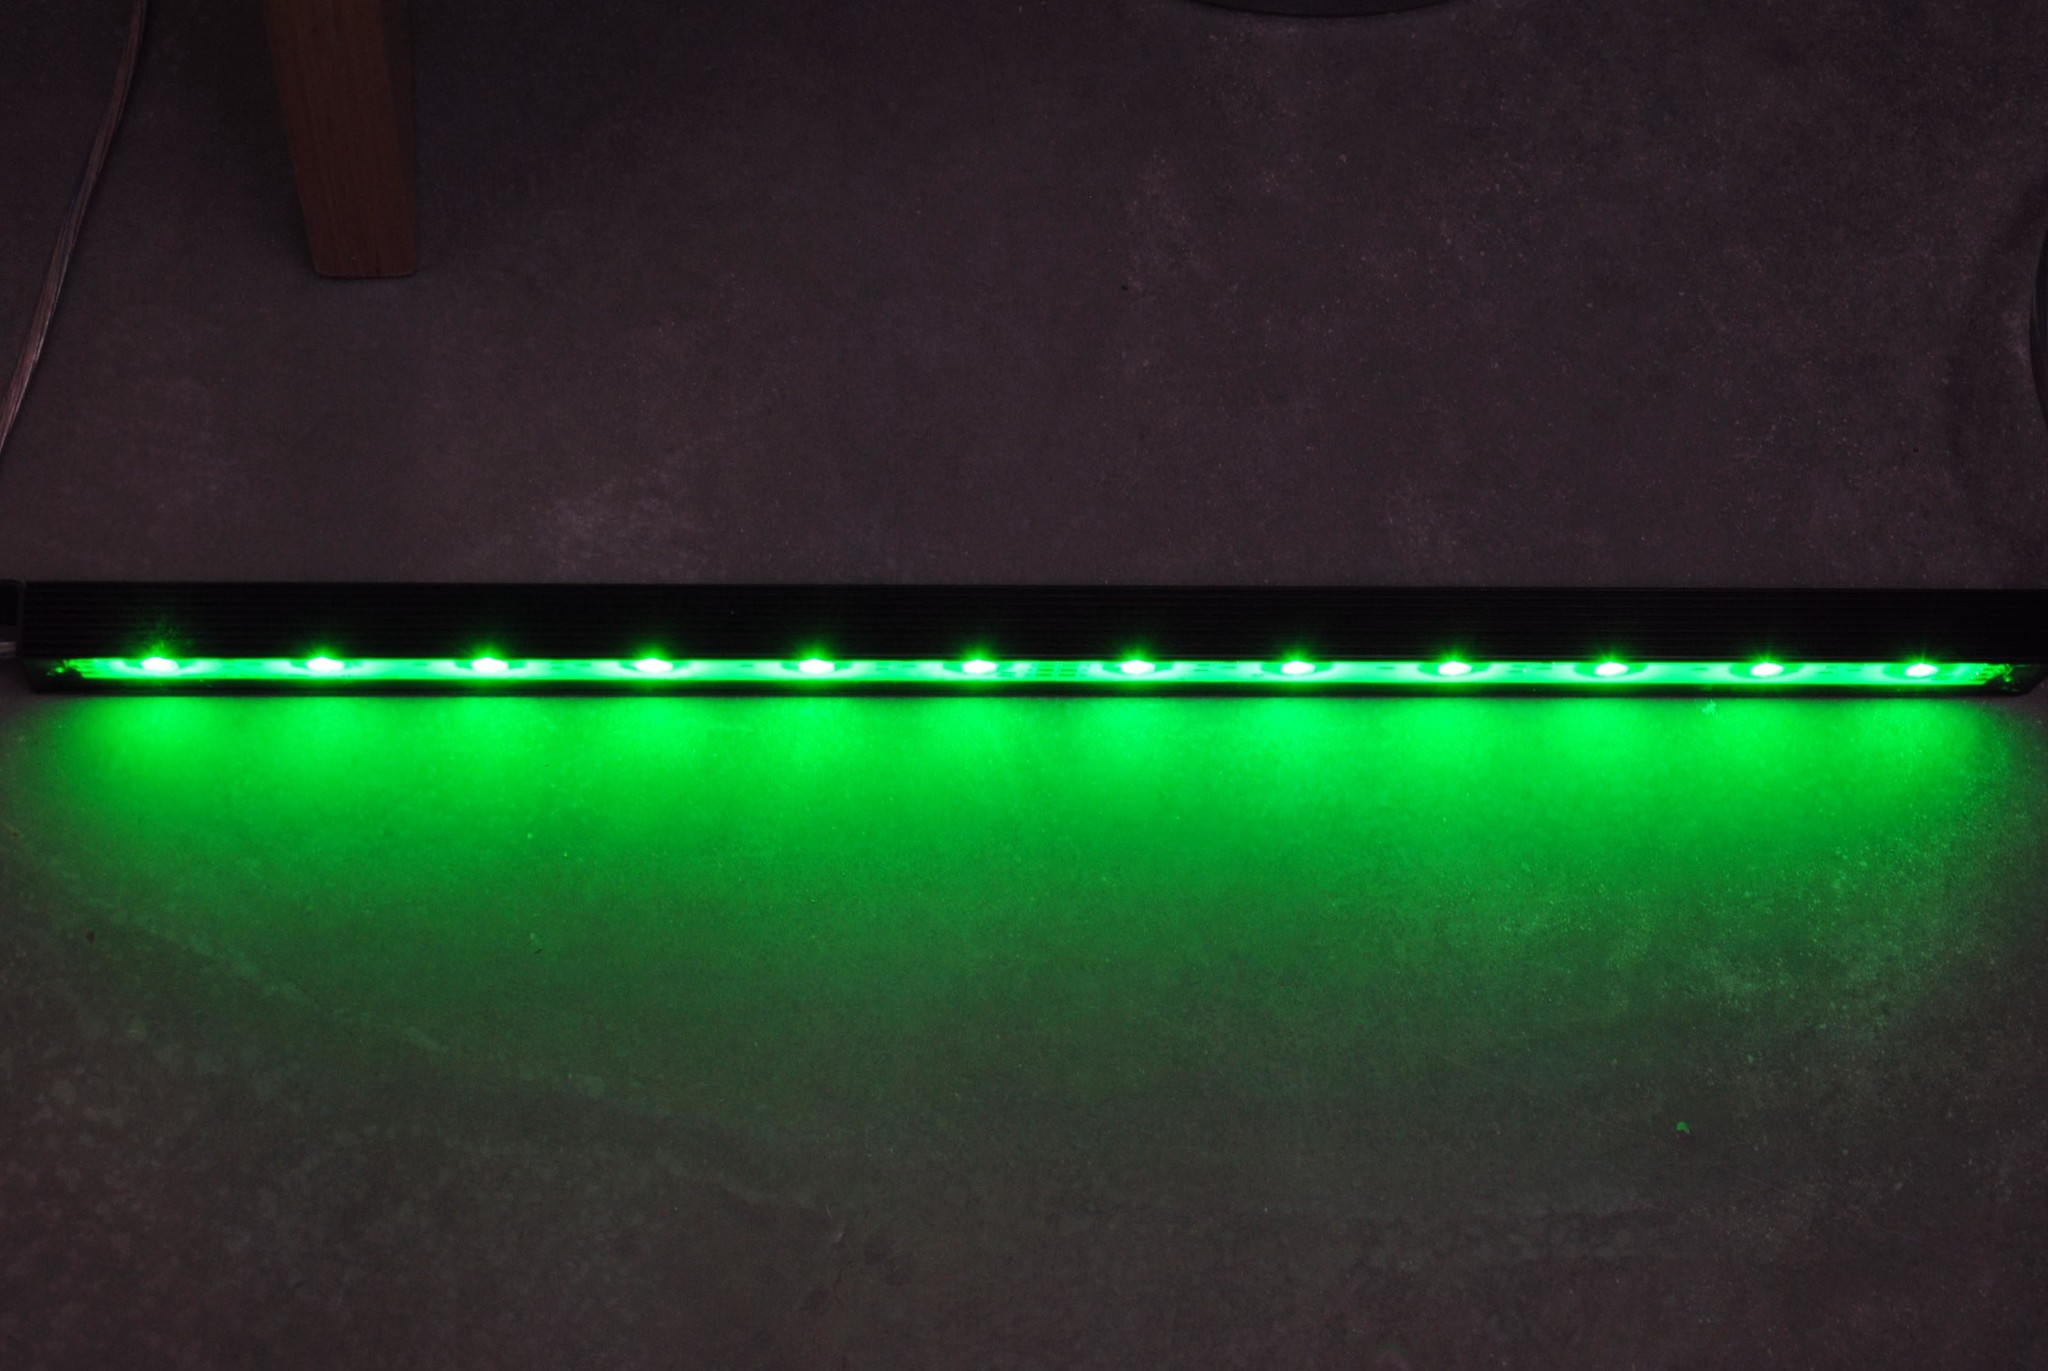 LED Leiste 50 Zentimeter LEDBAR PRO RGBWW IP68 Wasserdicht 12W 24V